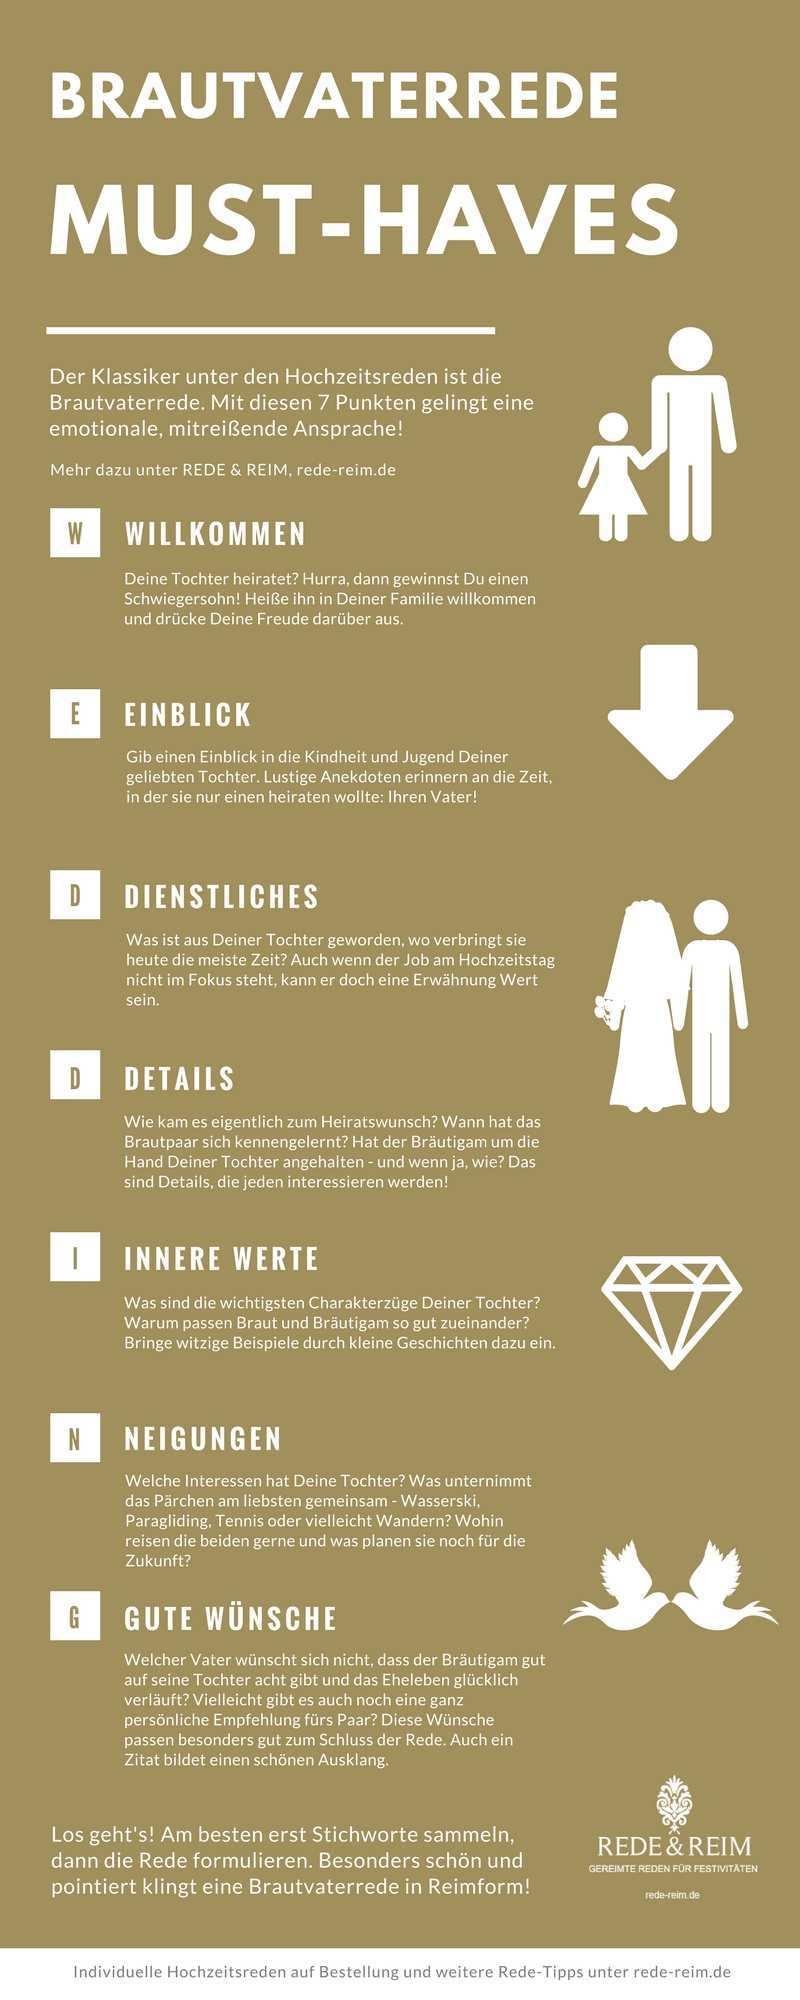 Brautvaterrede Schritt Fur Schritt In 7 Punkten Schreiben